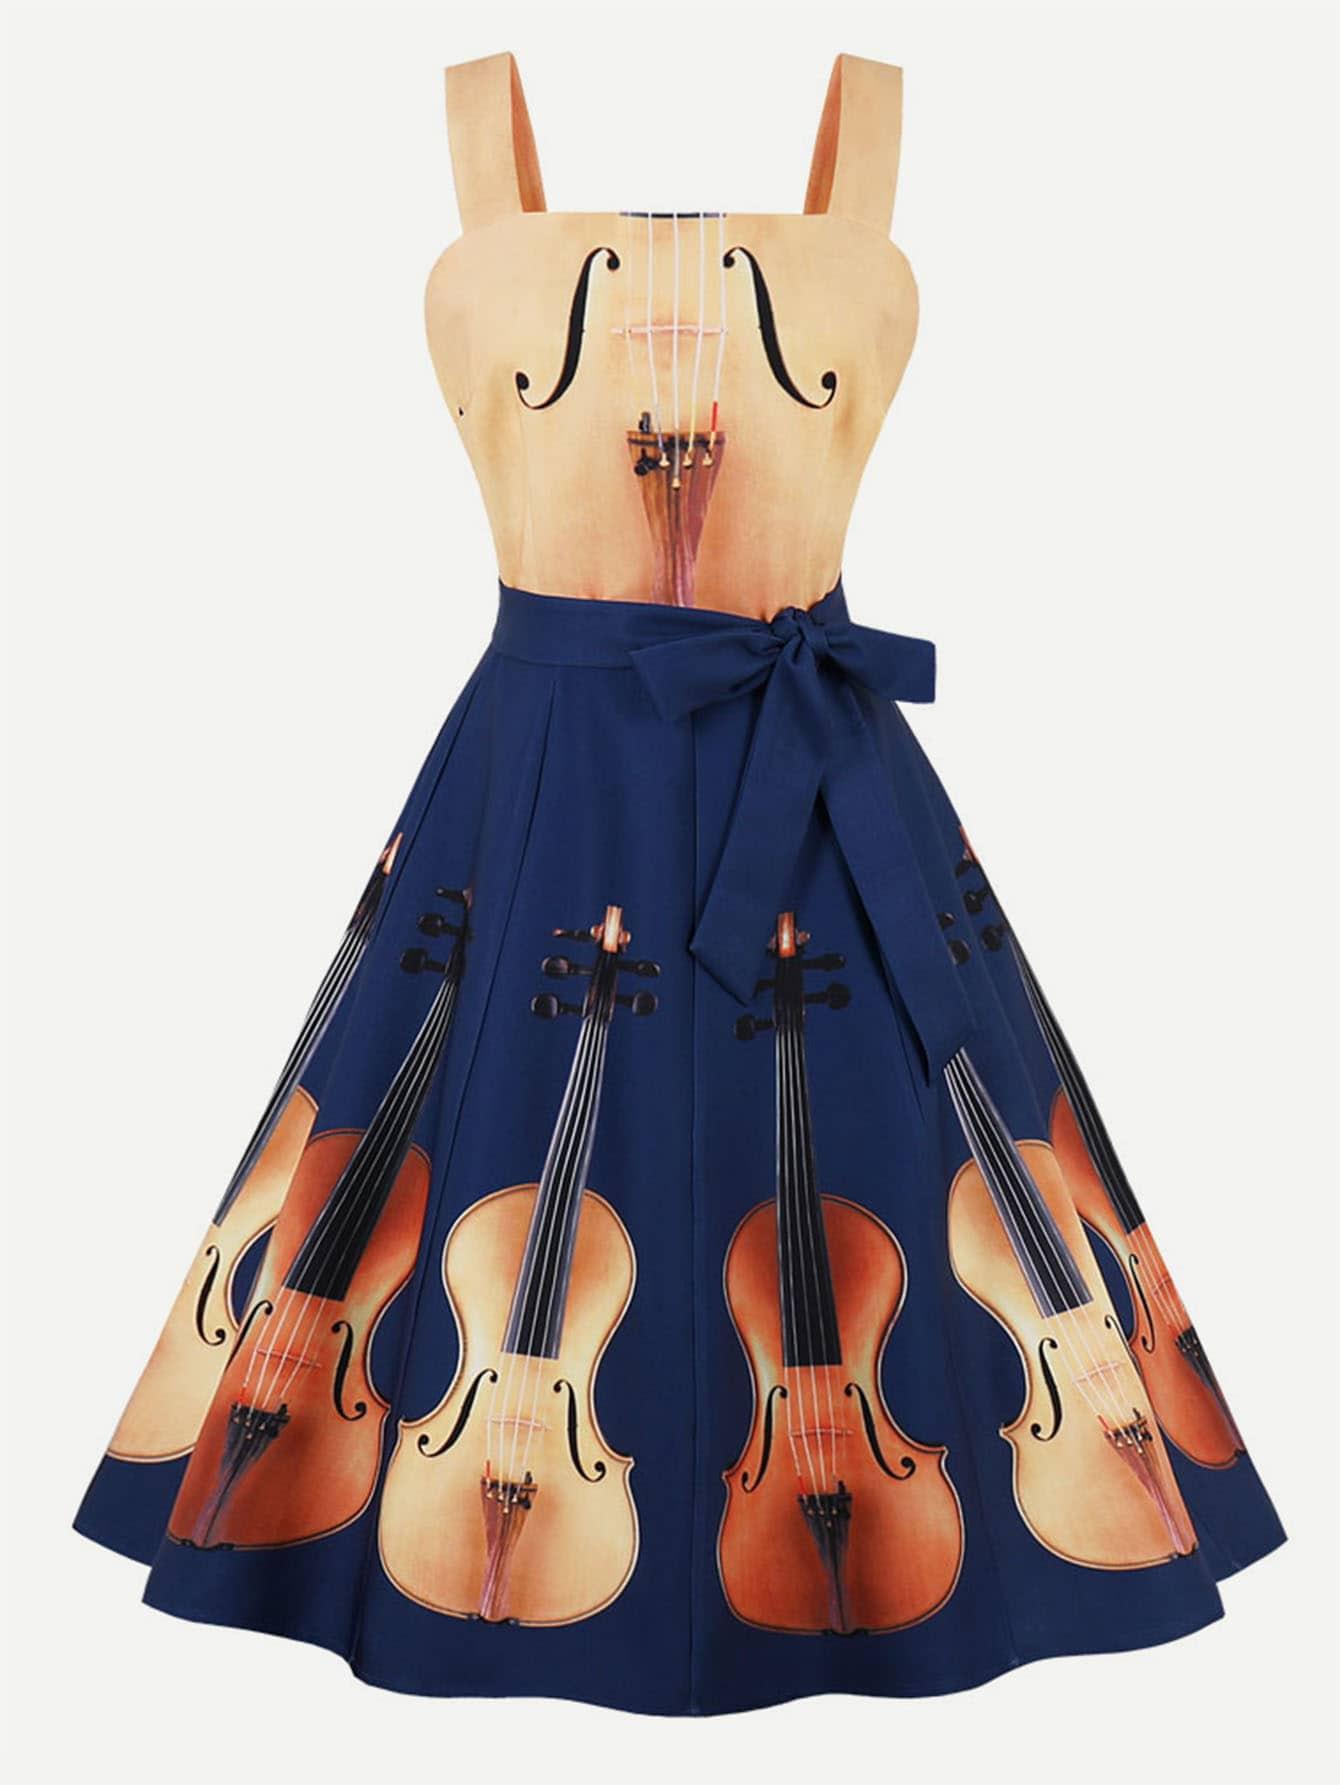 Guitar Print Knot Side Dress guitar print knot side dress